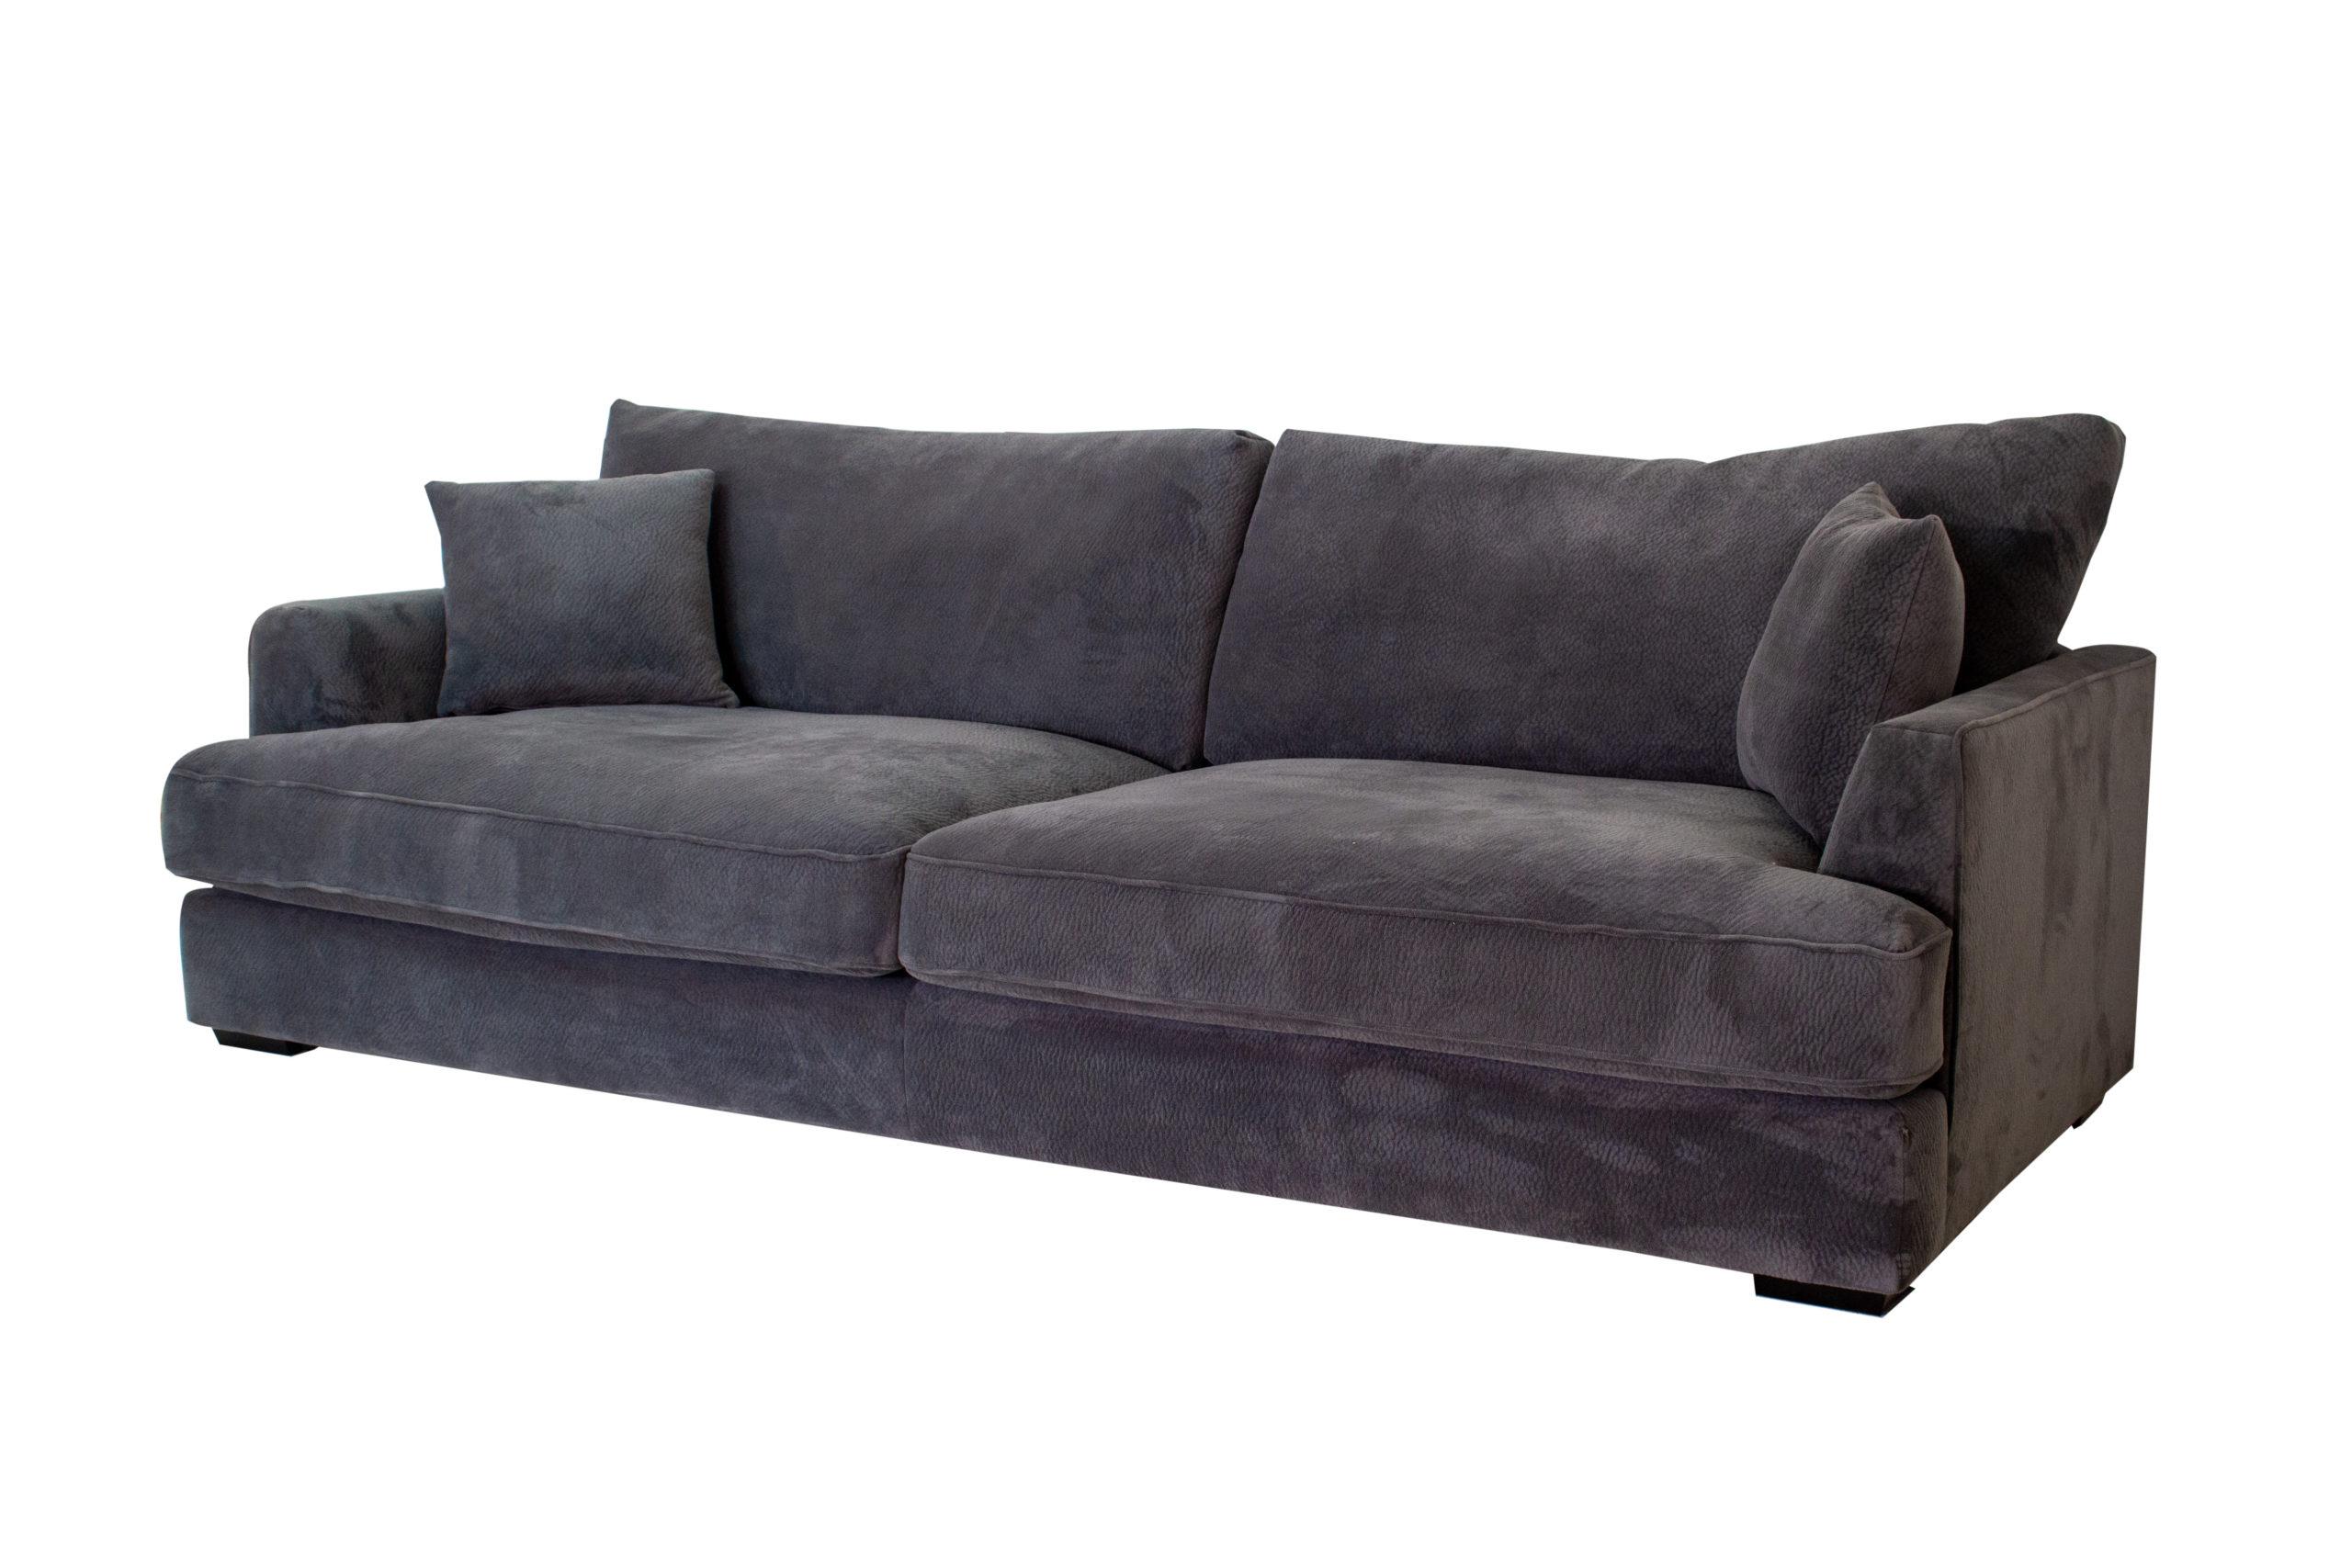 Aruba Oversized Living Room Set, Oversized Living Room Furniture